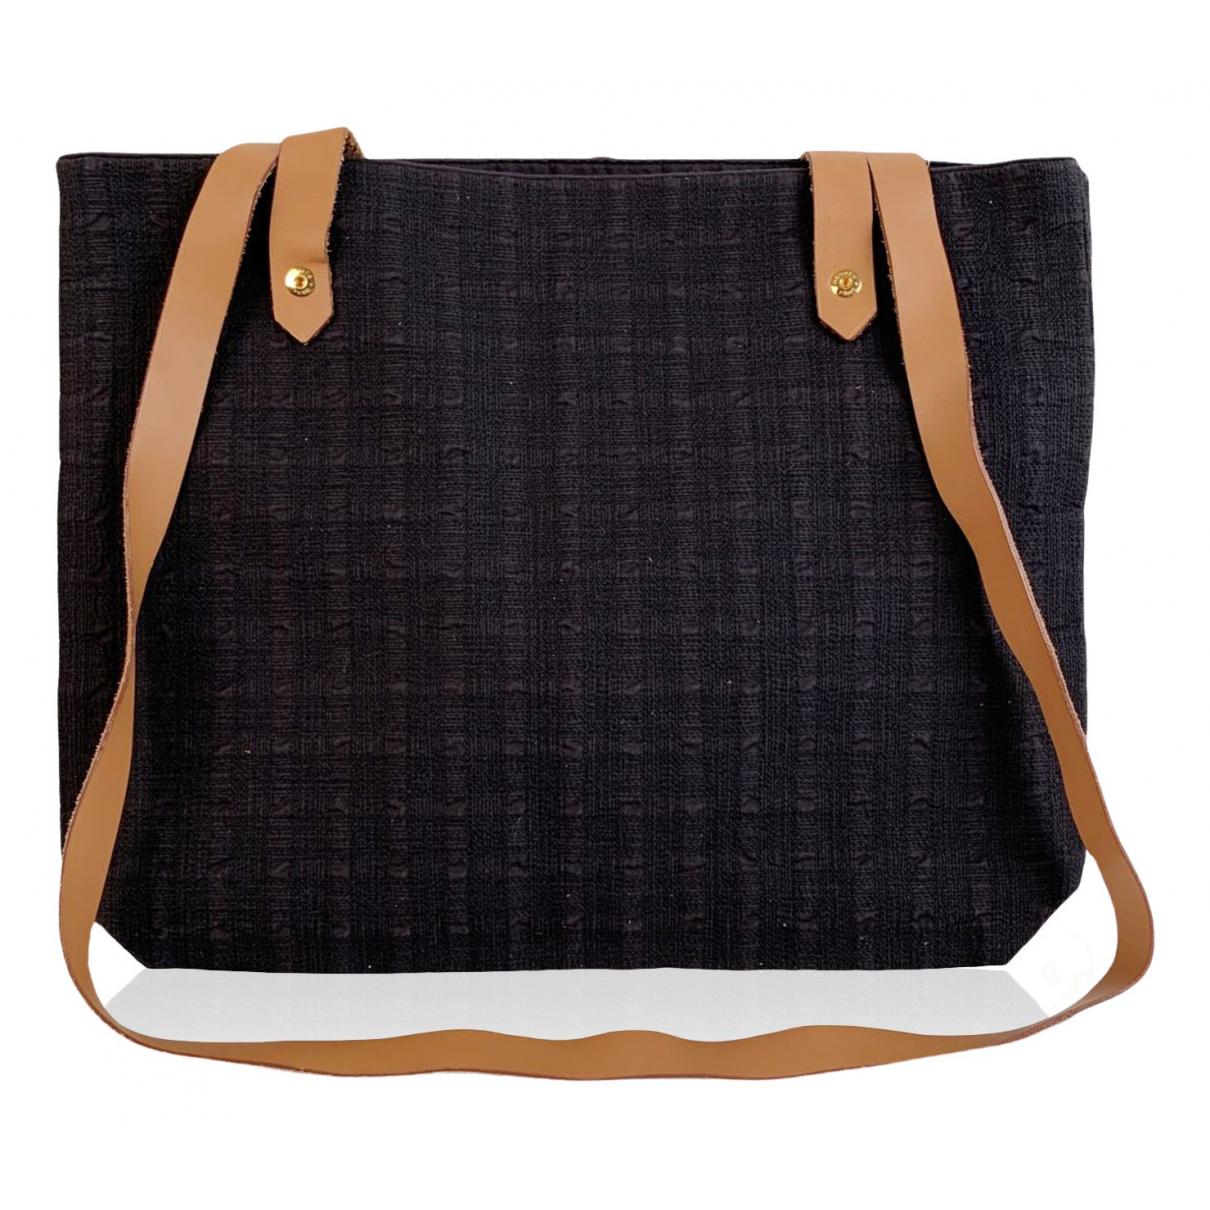 Hermes \N Handtasche in  Schwarz Leinen